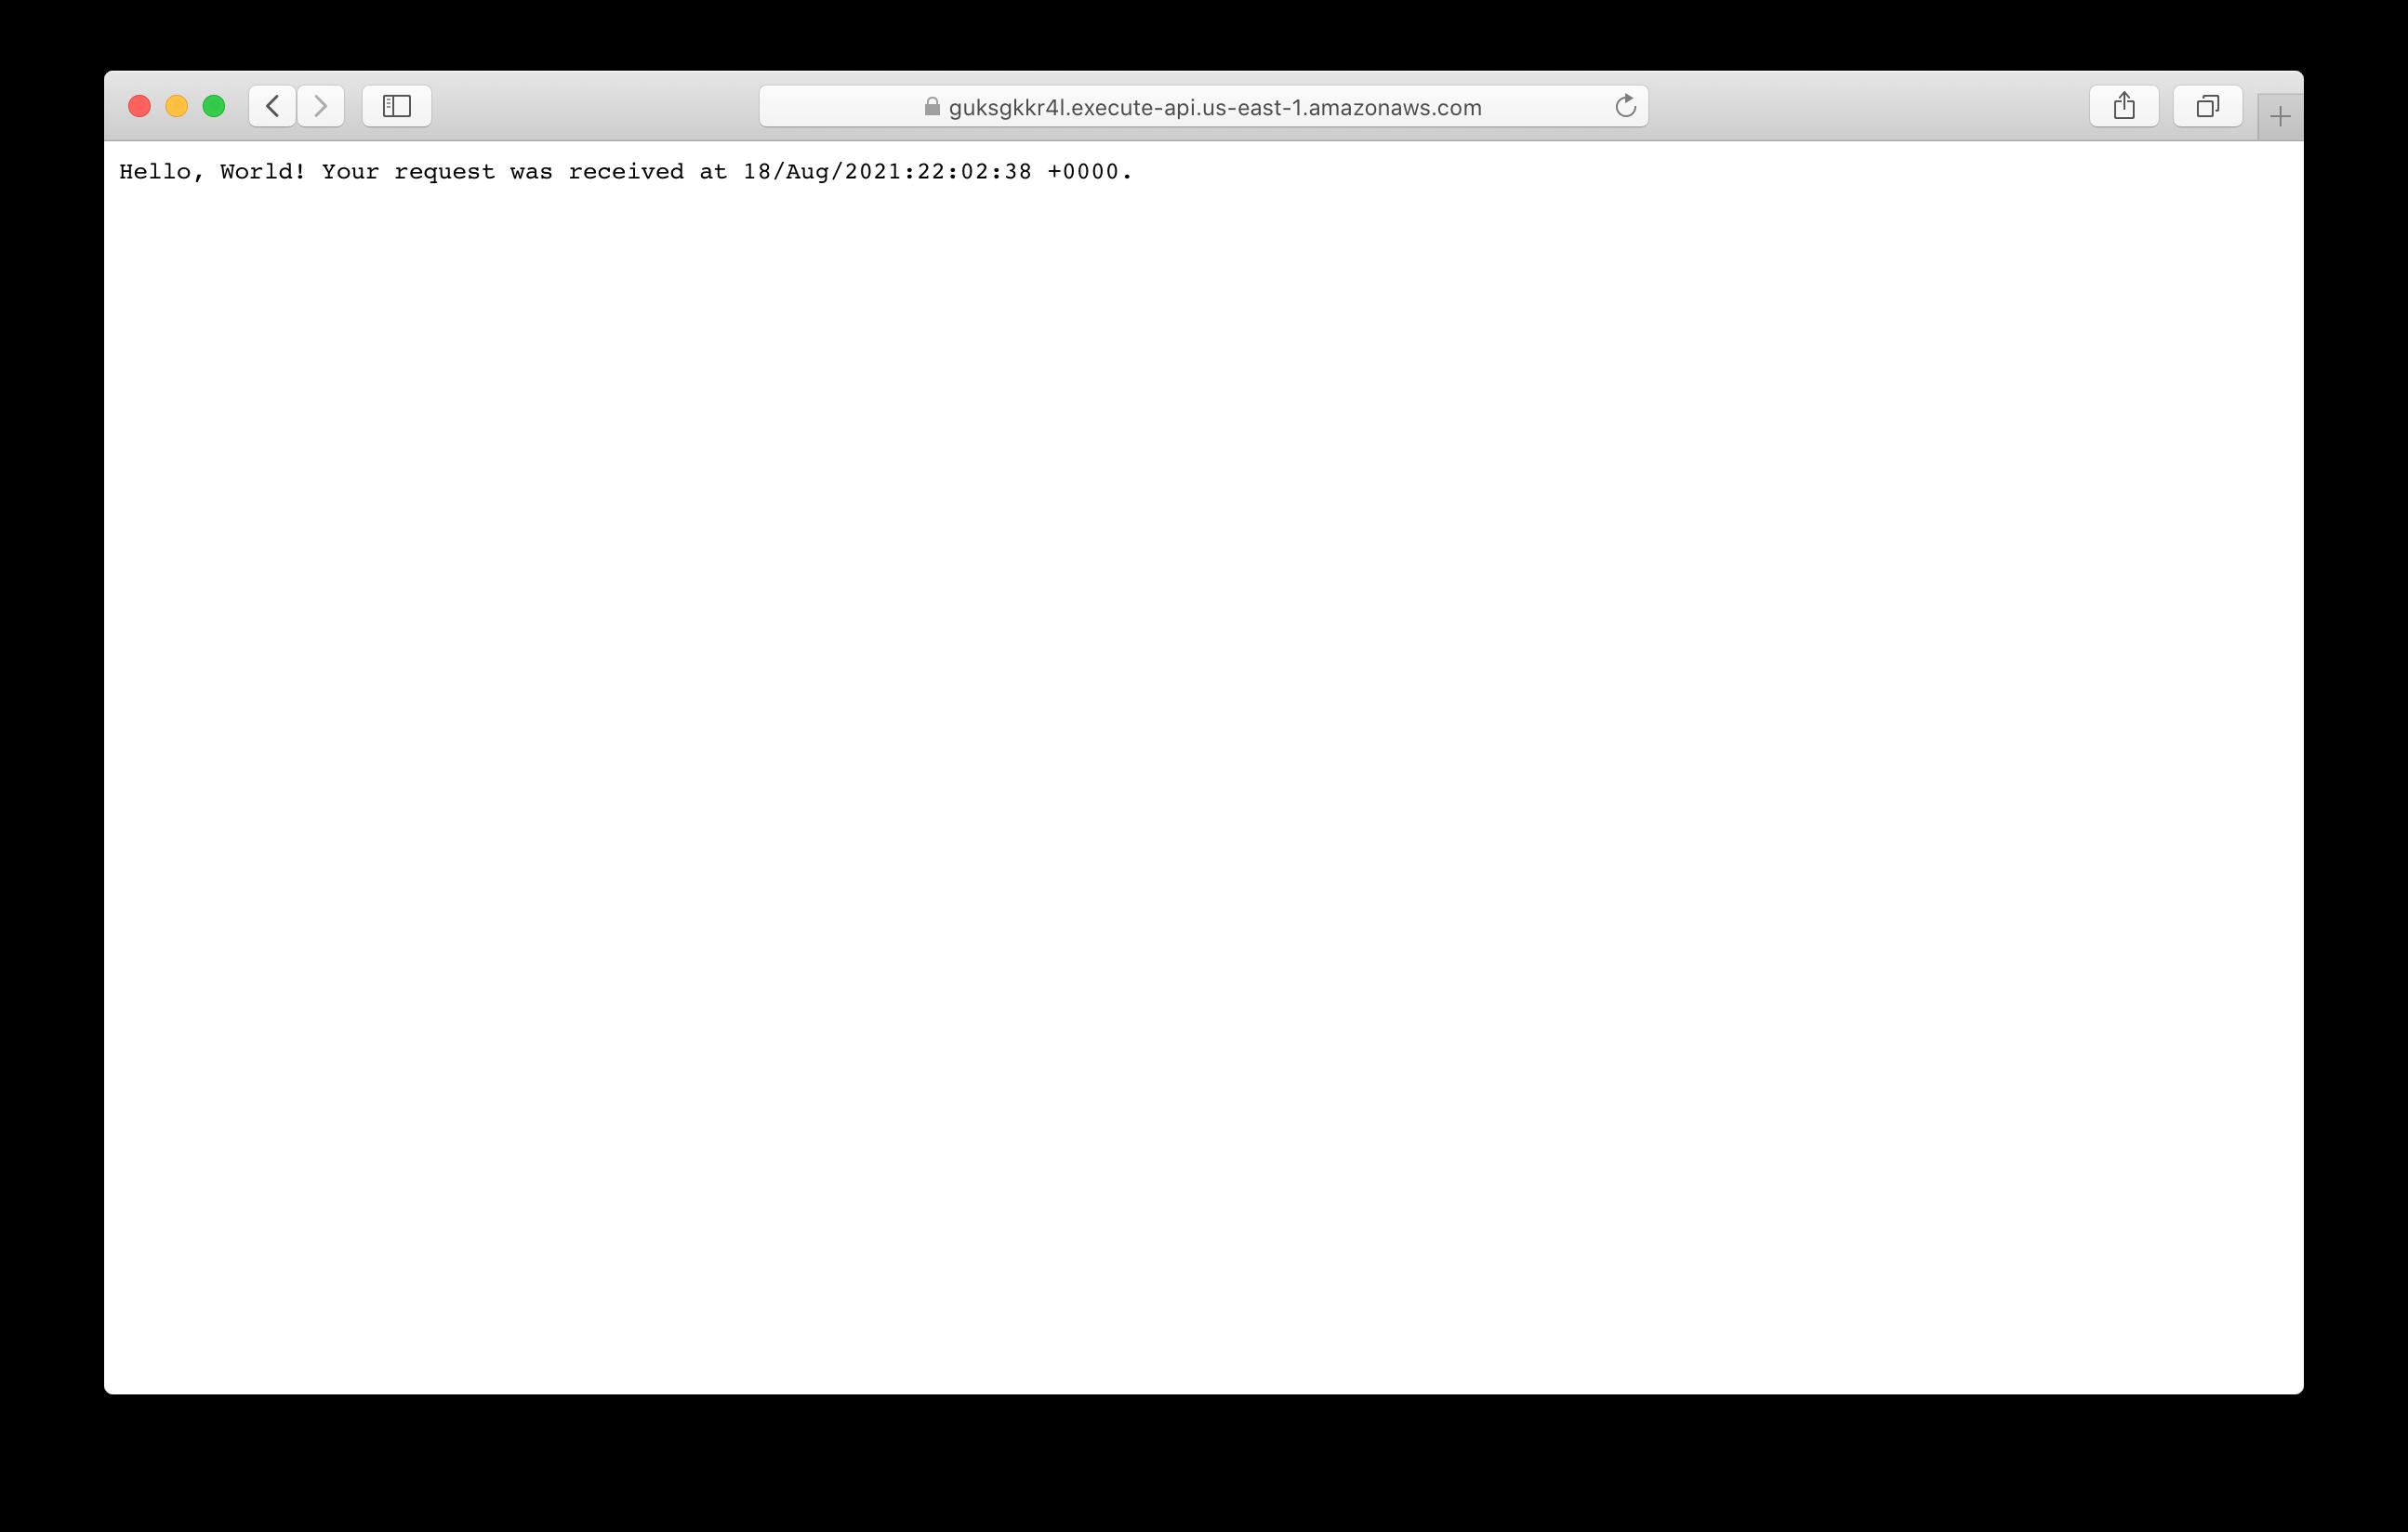 Serverless Hello World API invoked